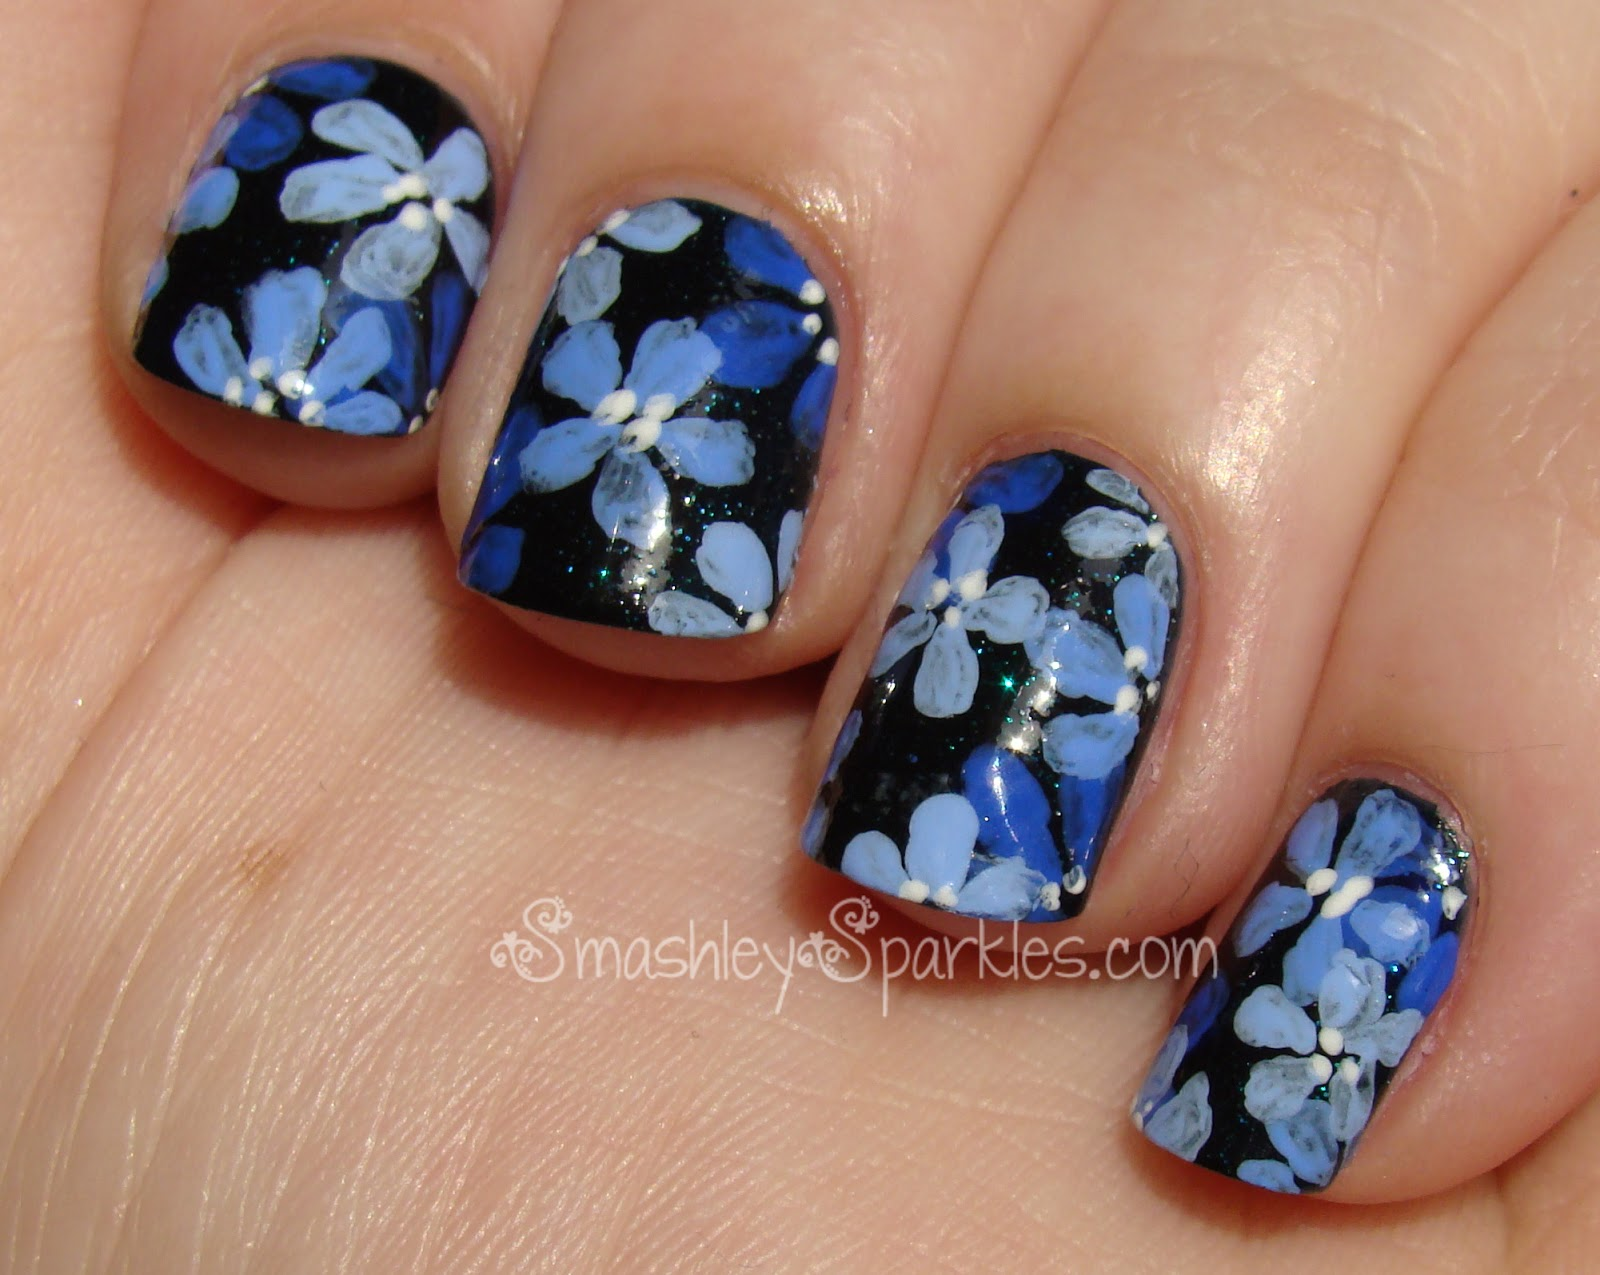 Blue+flower+nail+art+cult+nails+living+water 002.JPG : 6 Blue Prom ...